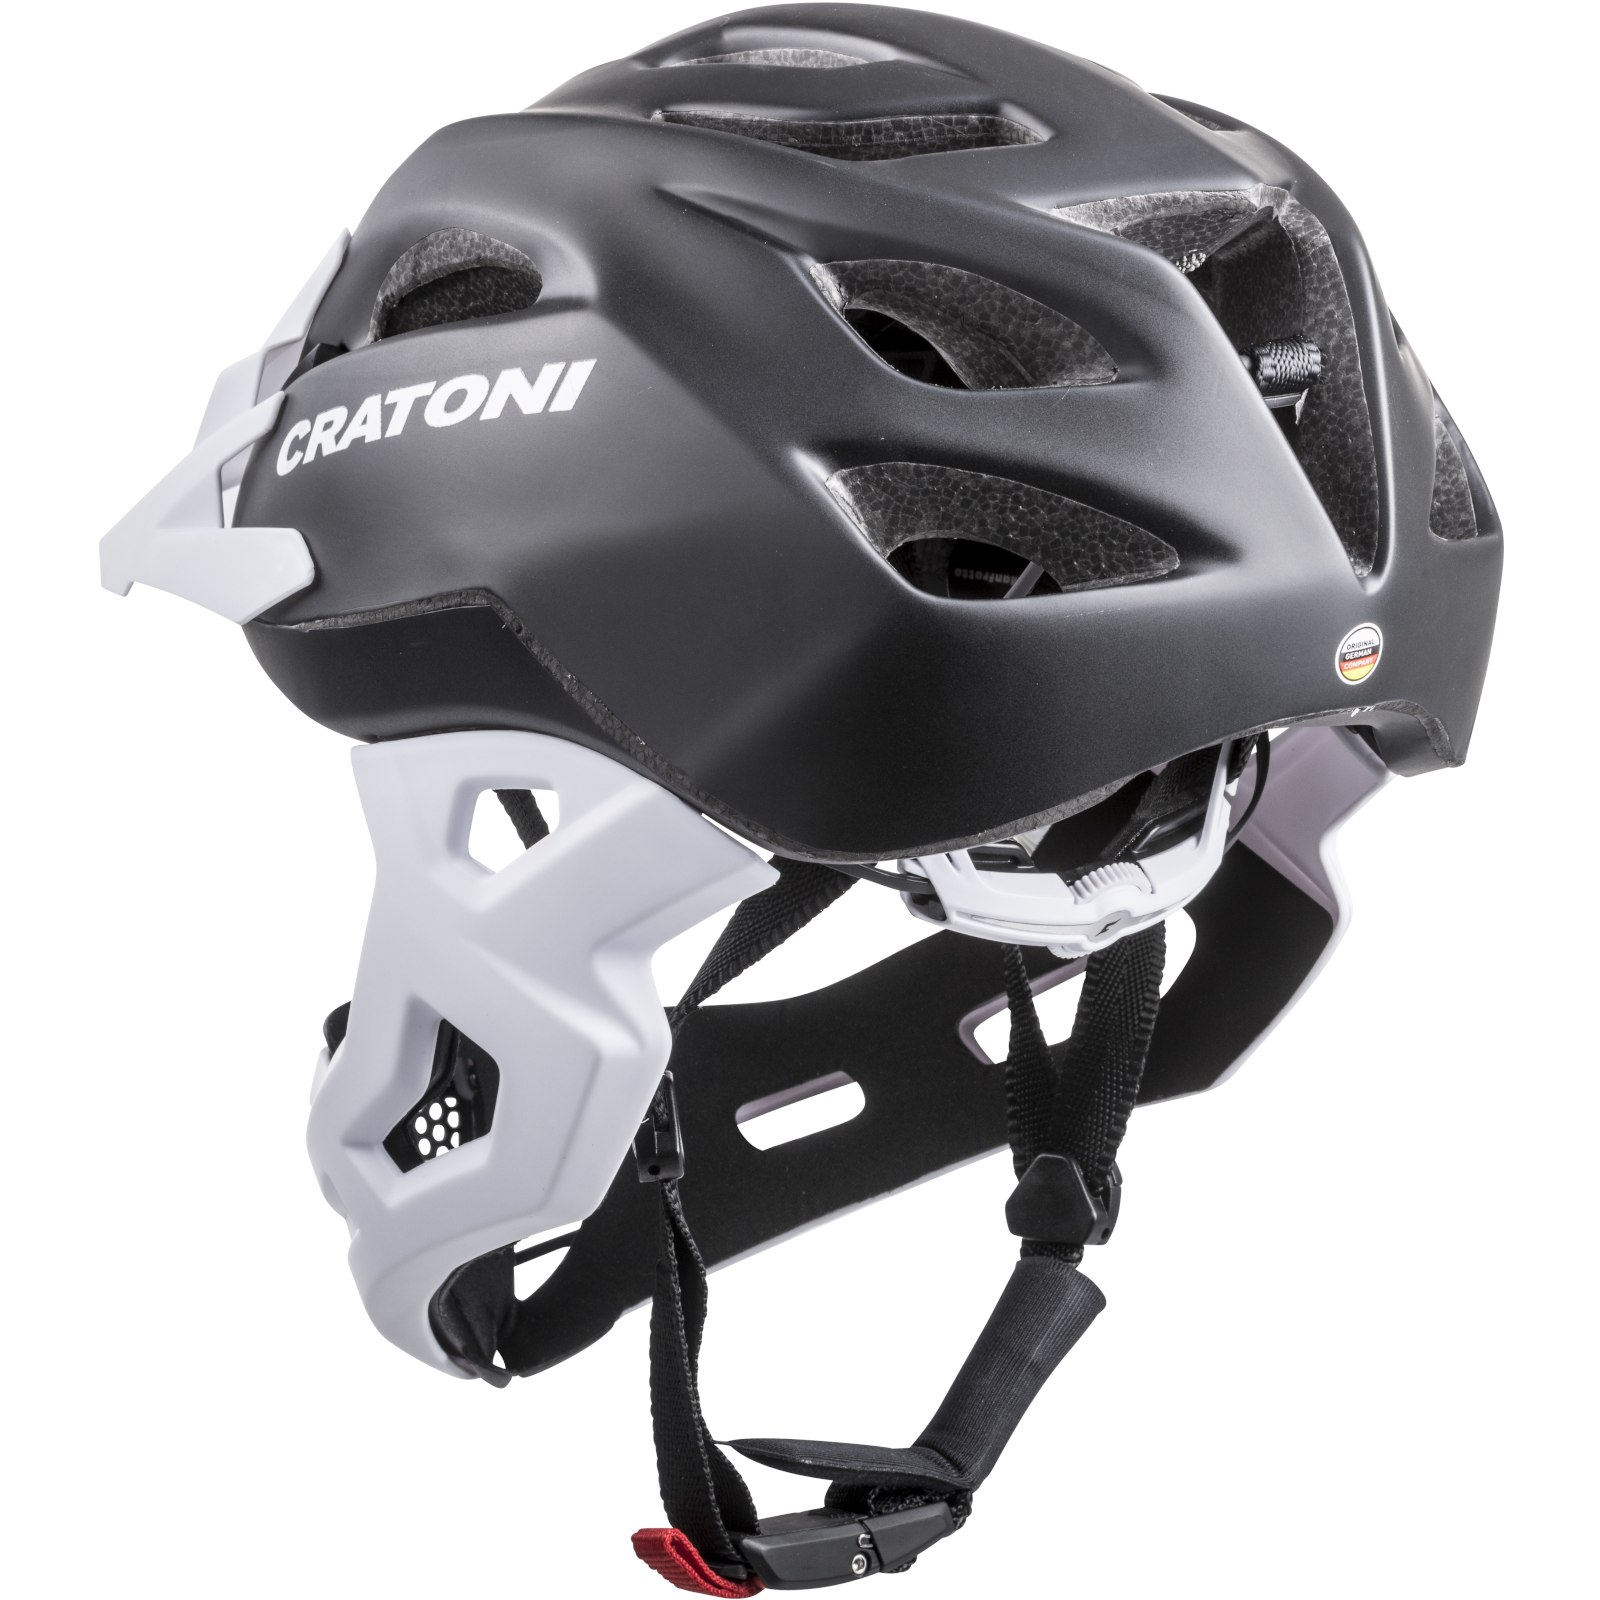 Image of CRATONI C-Maniac Fullface Helmet - black matt